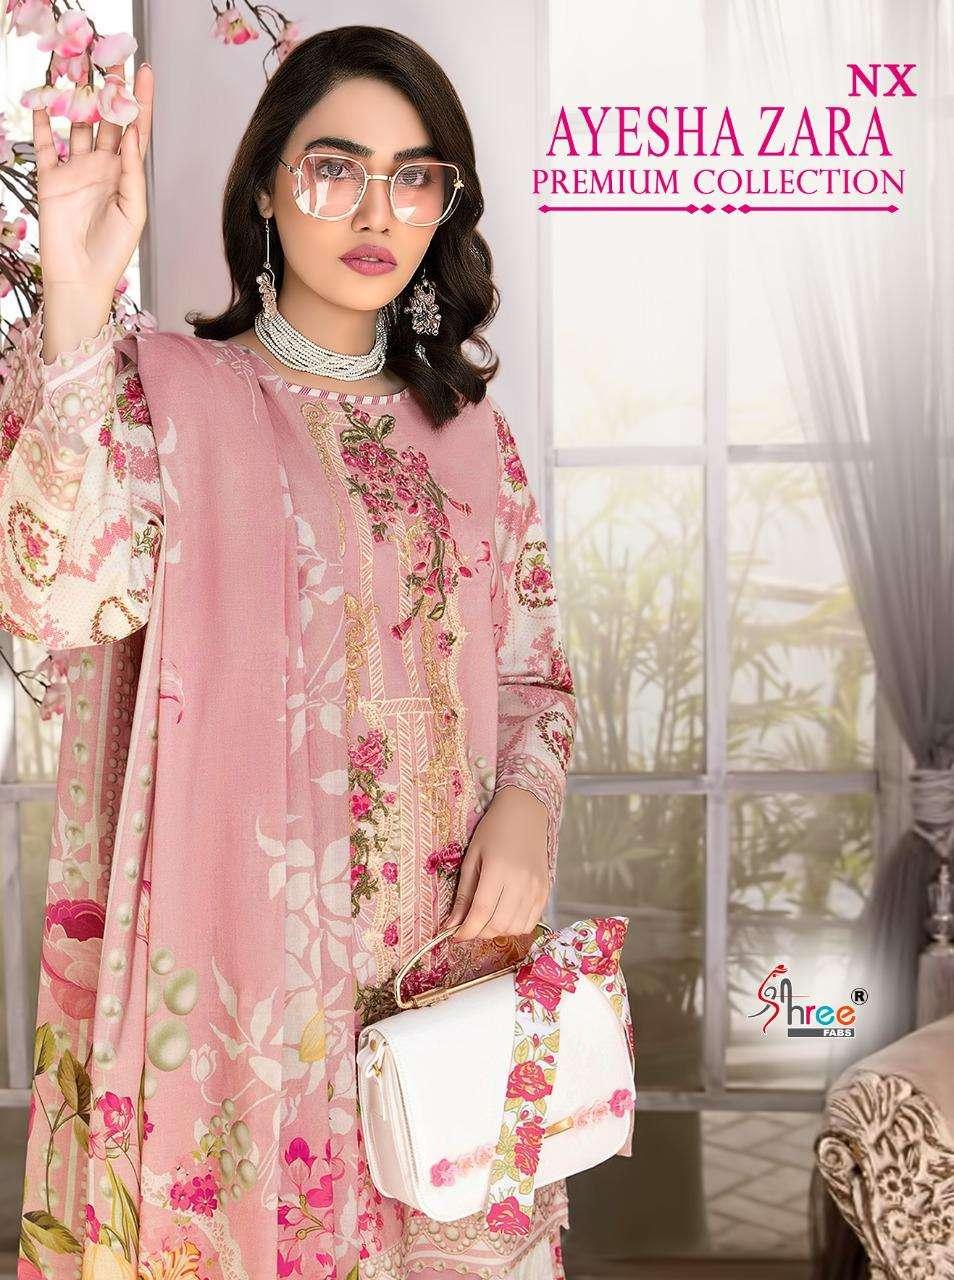 Shree Fabs Ayesha Zara Premium Collection NX Pakistani Suits Catalogue